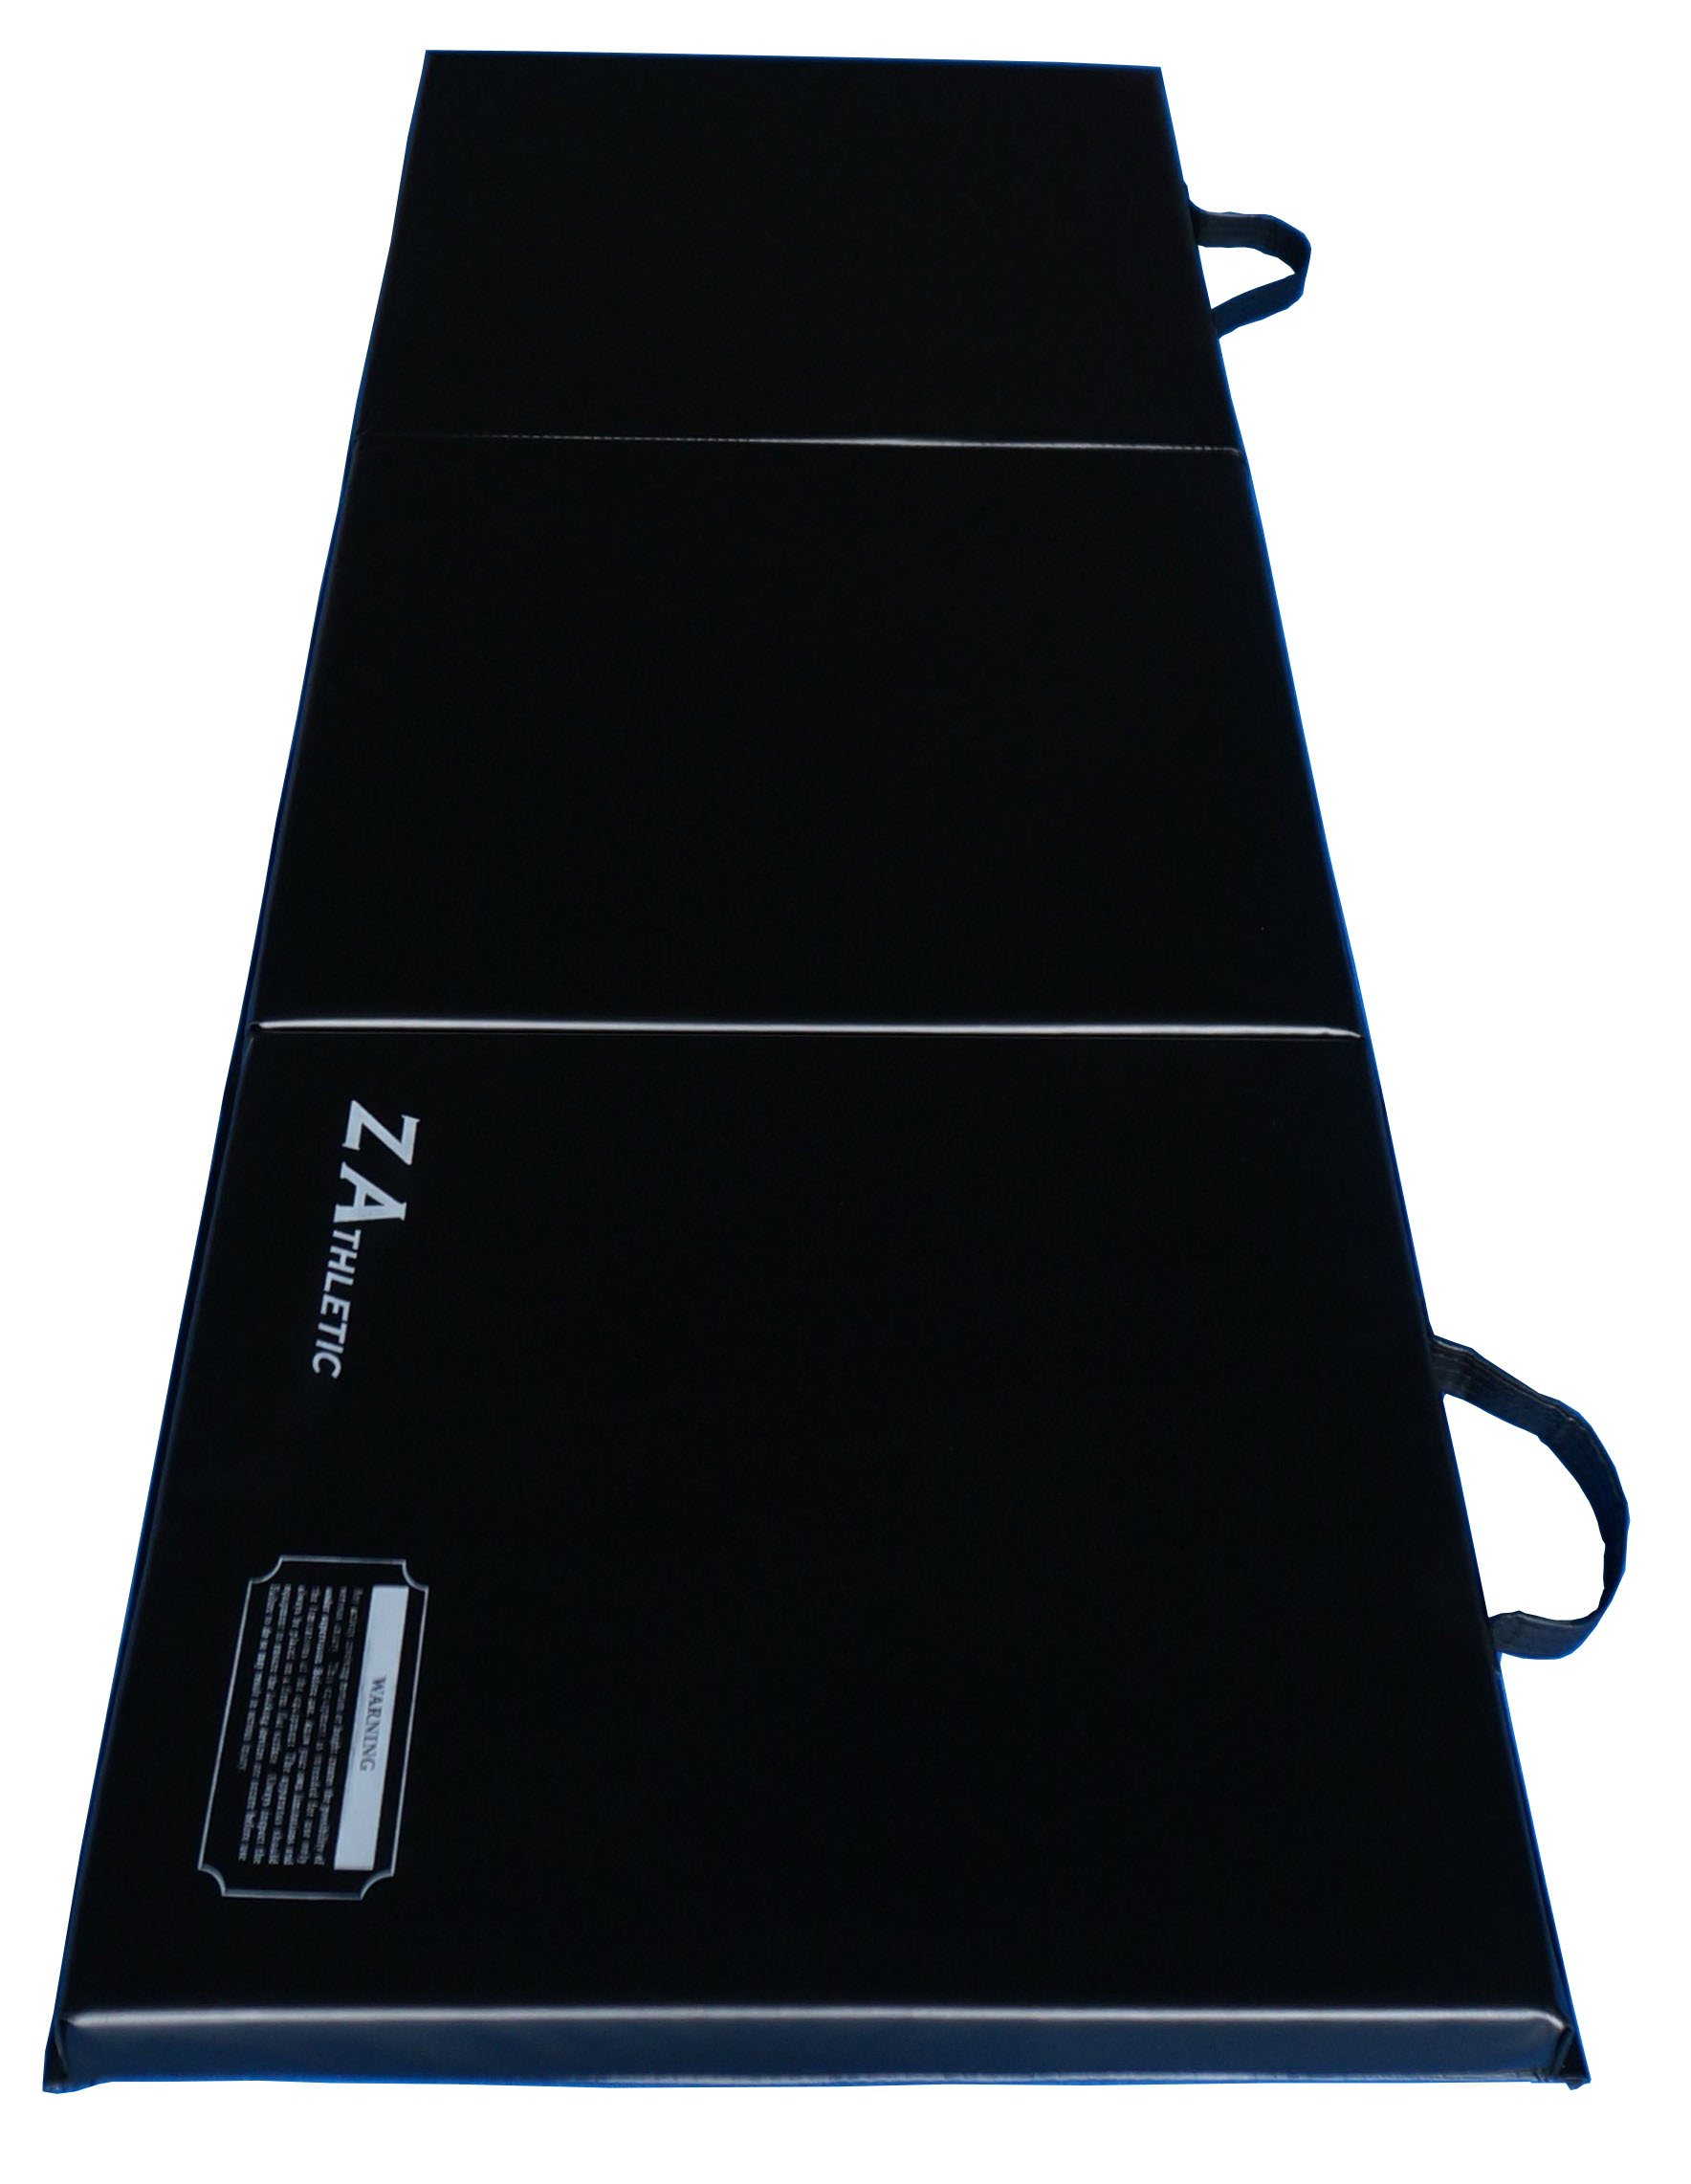 Z-Athletic Folding Panel Mats for Gymnastics, Yoga, Martial Arts, & Tumbling (2ft x 6ft x 2in, Black)